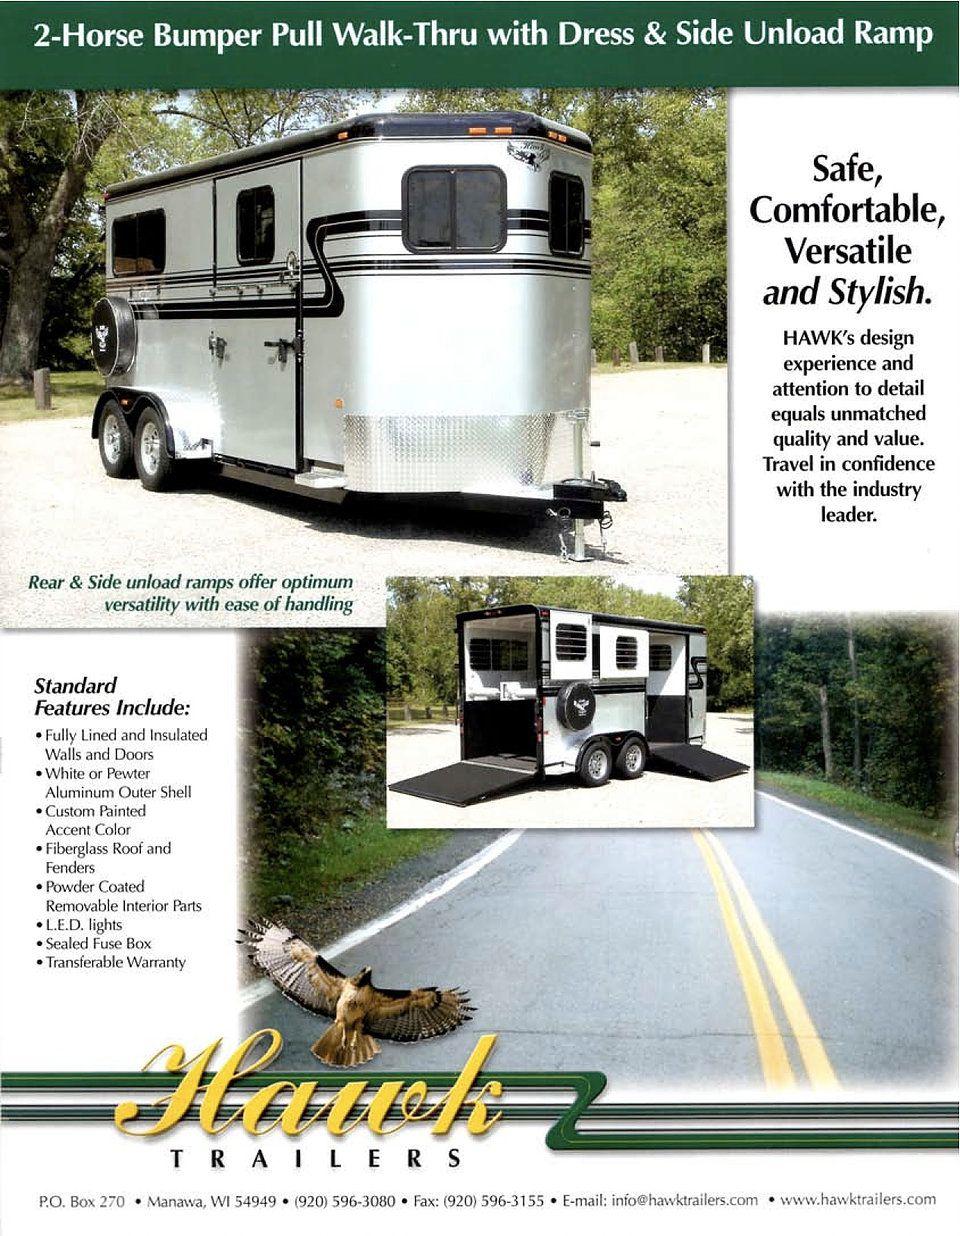 2 Horse Xl Bumper Pull Hawk Trailer 9500 Brochure Farm Fuse Box